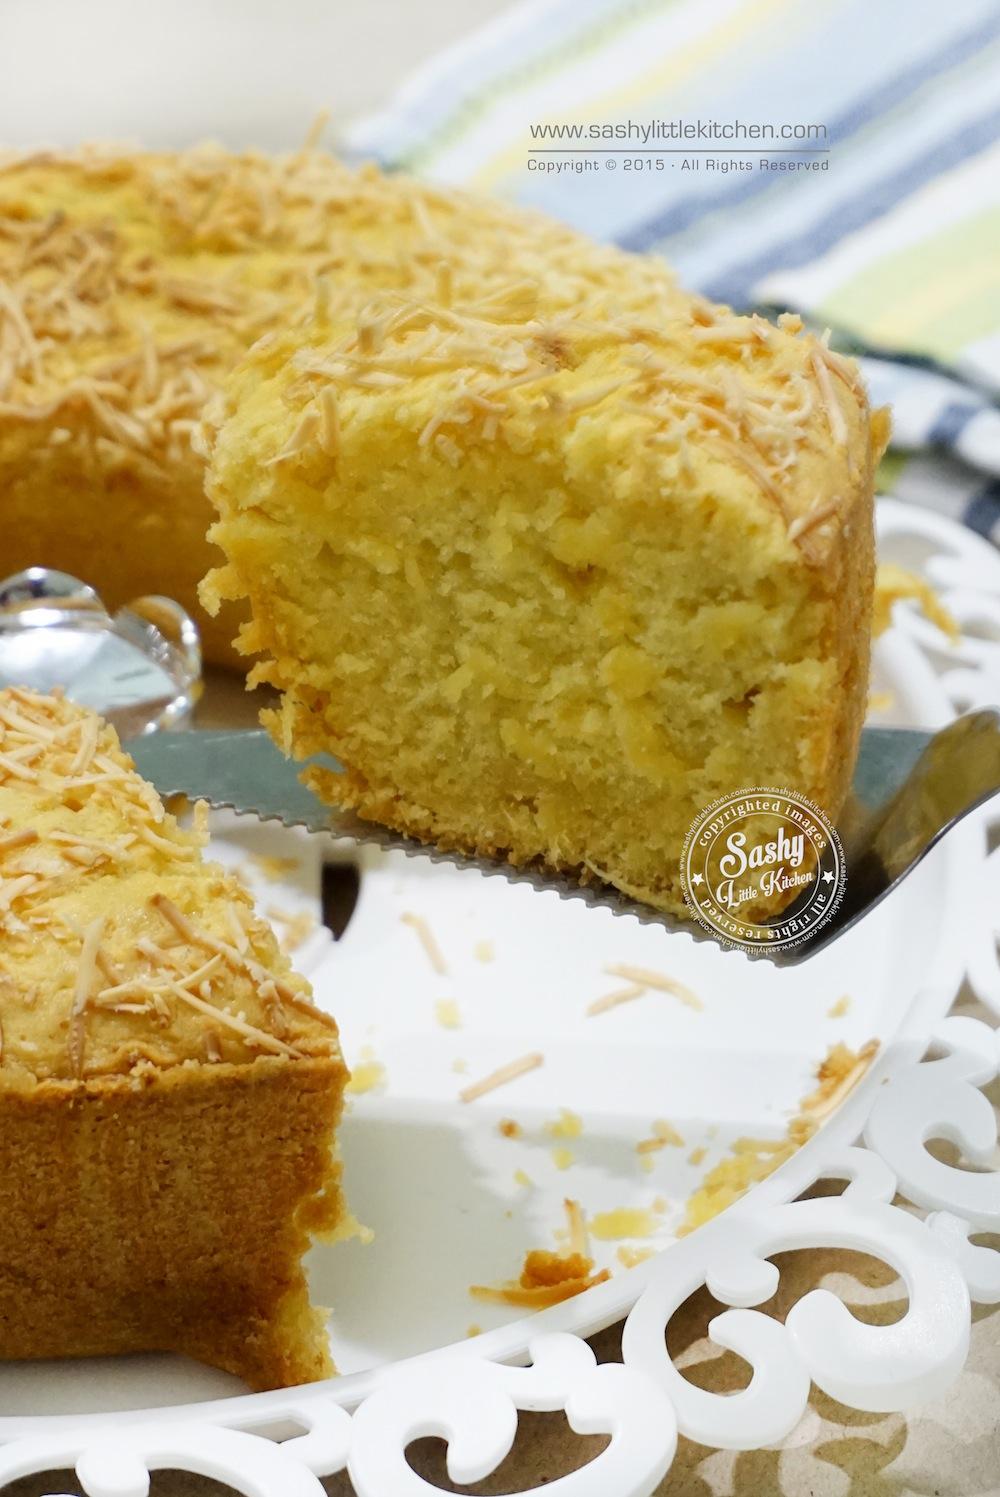 Resep Kue Kacang Ricke Ordinary Kitchen Good Resep Kue Kering